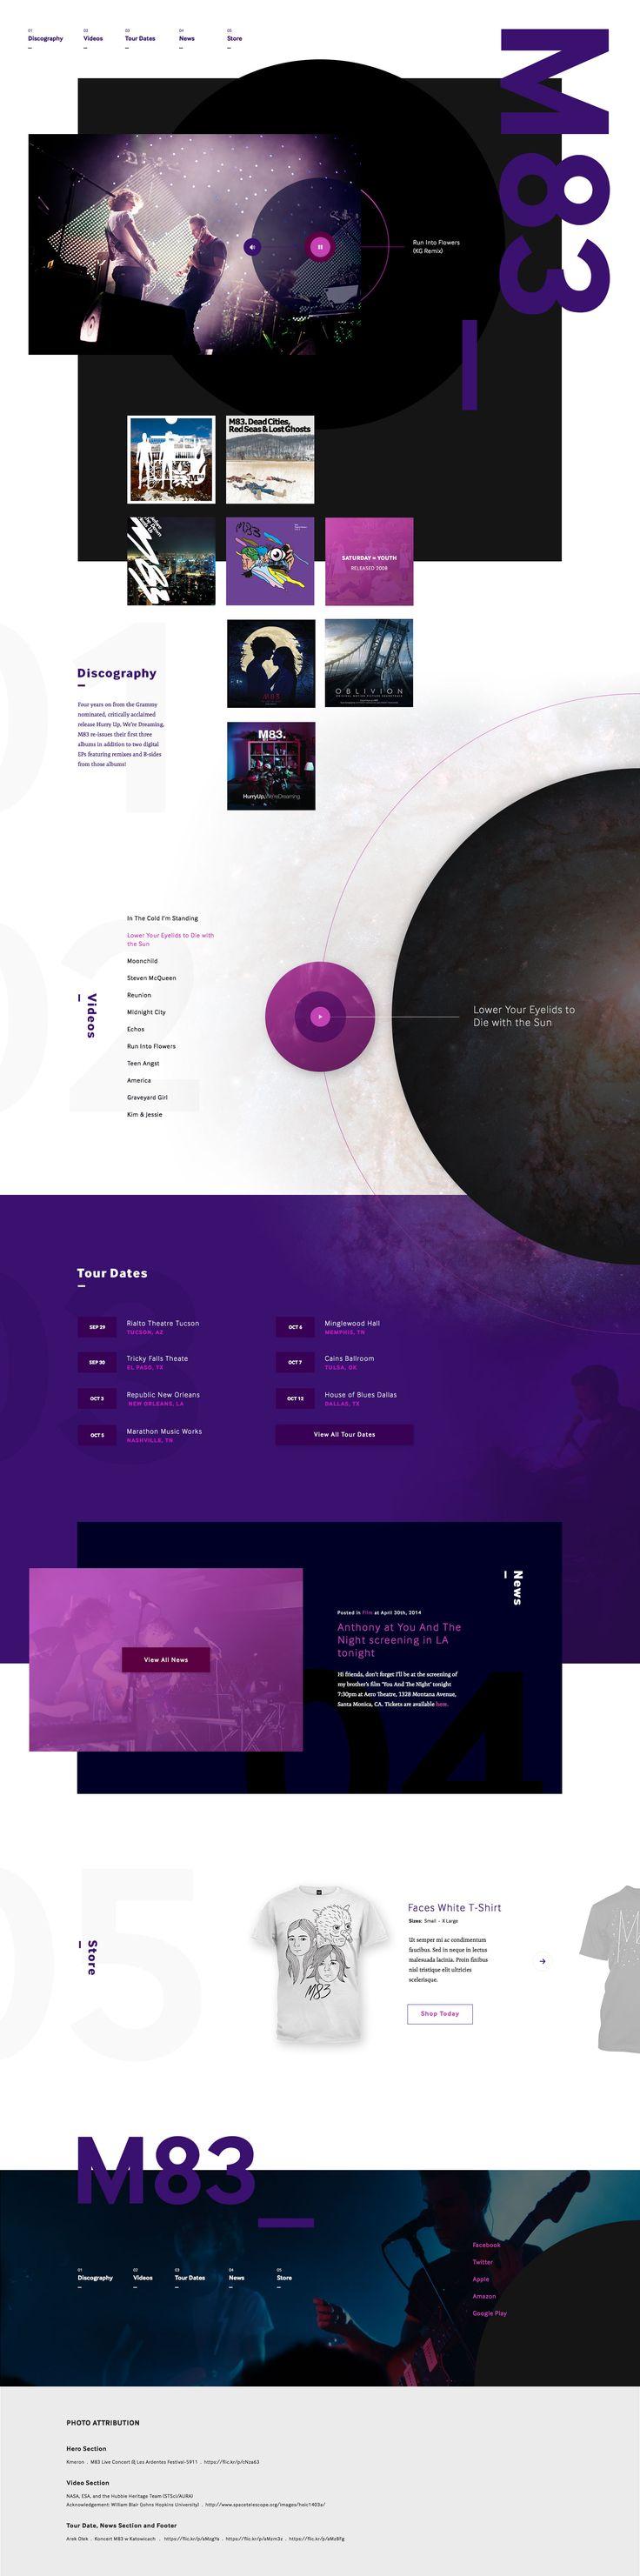 M83. Music web design. Portfolio for a singer or band.